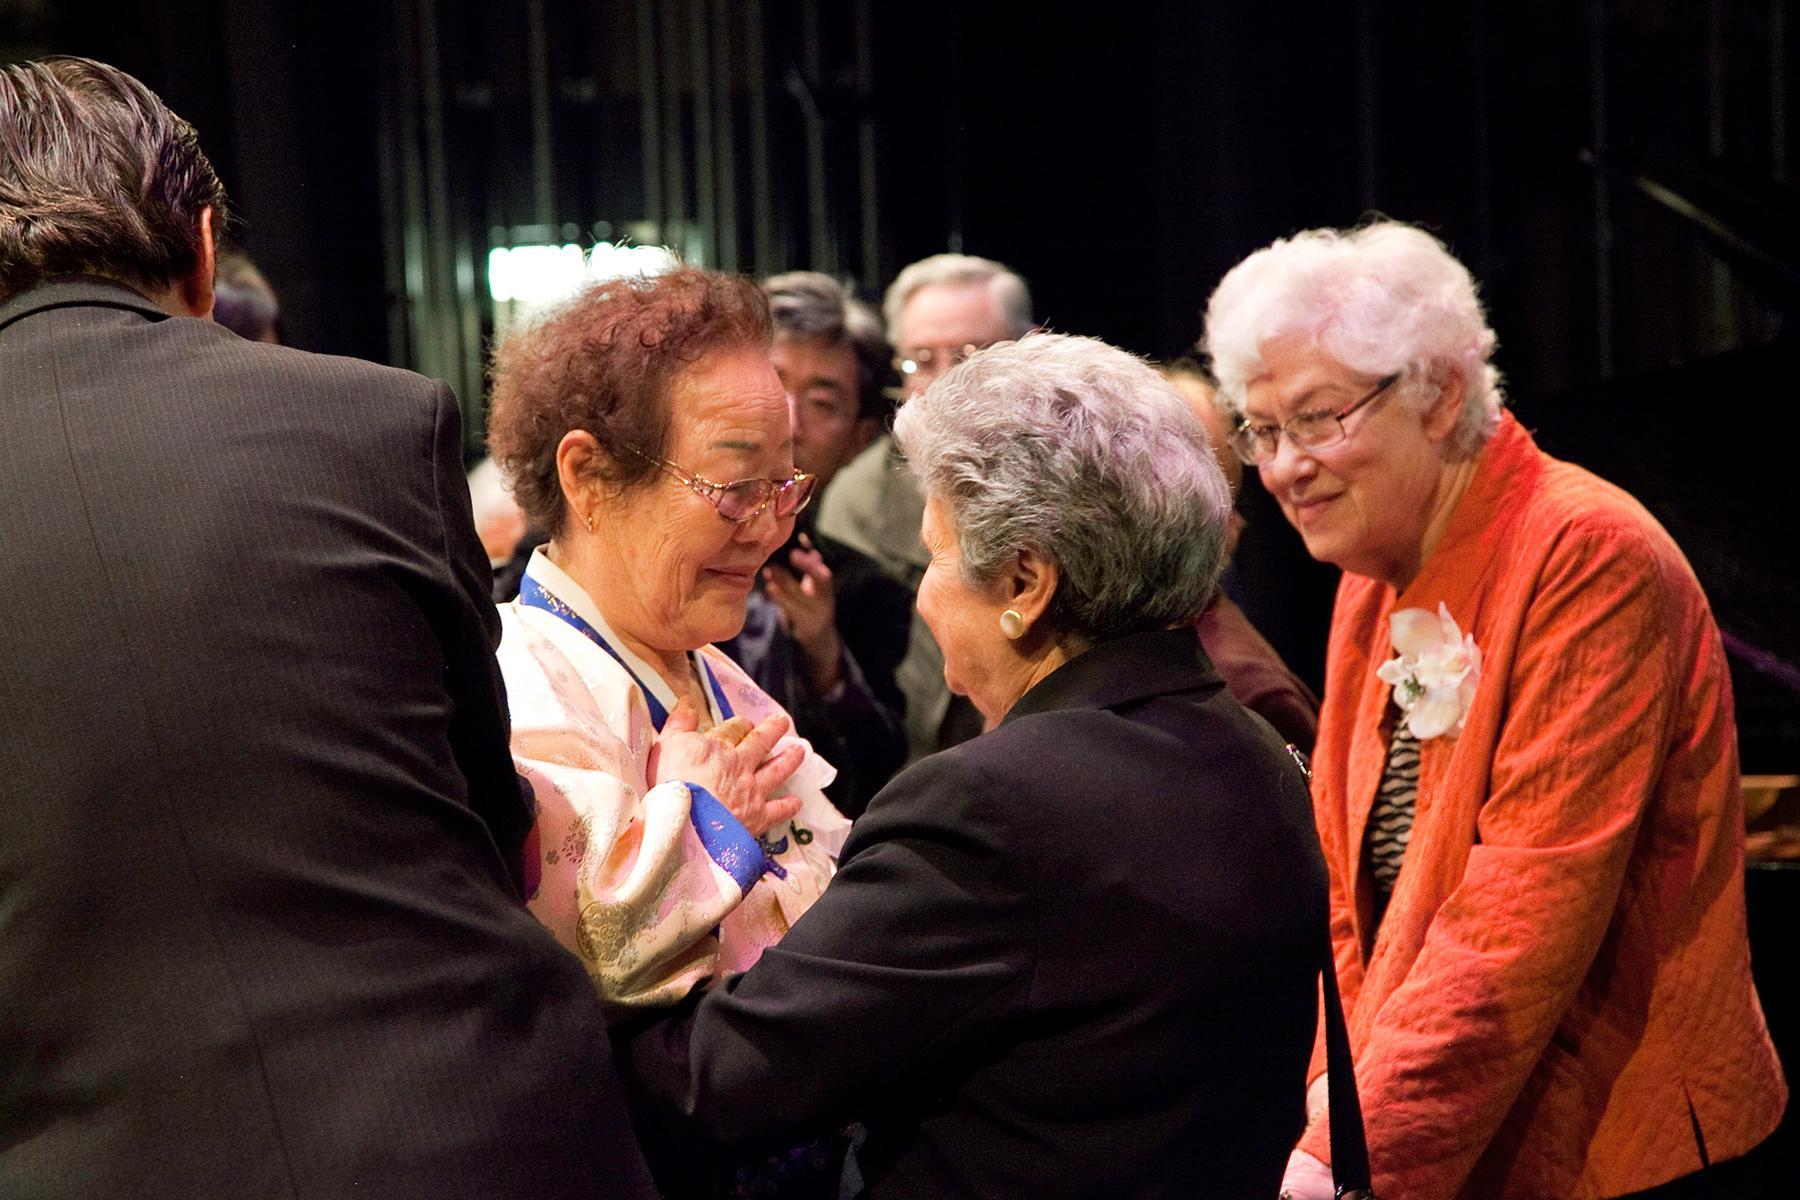 Lee Yong Soo Halmoni and Ethel Katz embracing, Kupferburg Holocaust Center, Queens, NY, 2011